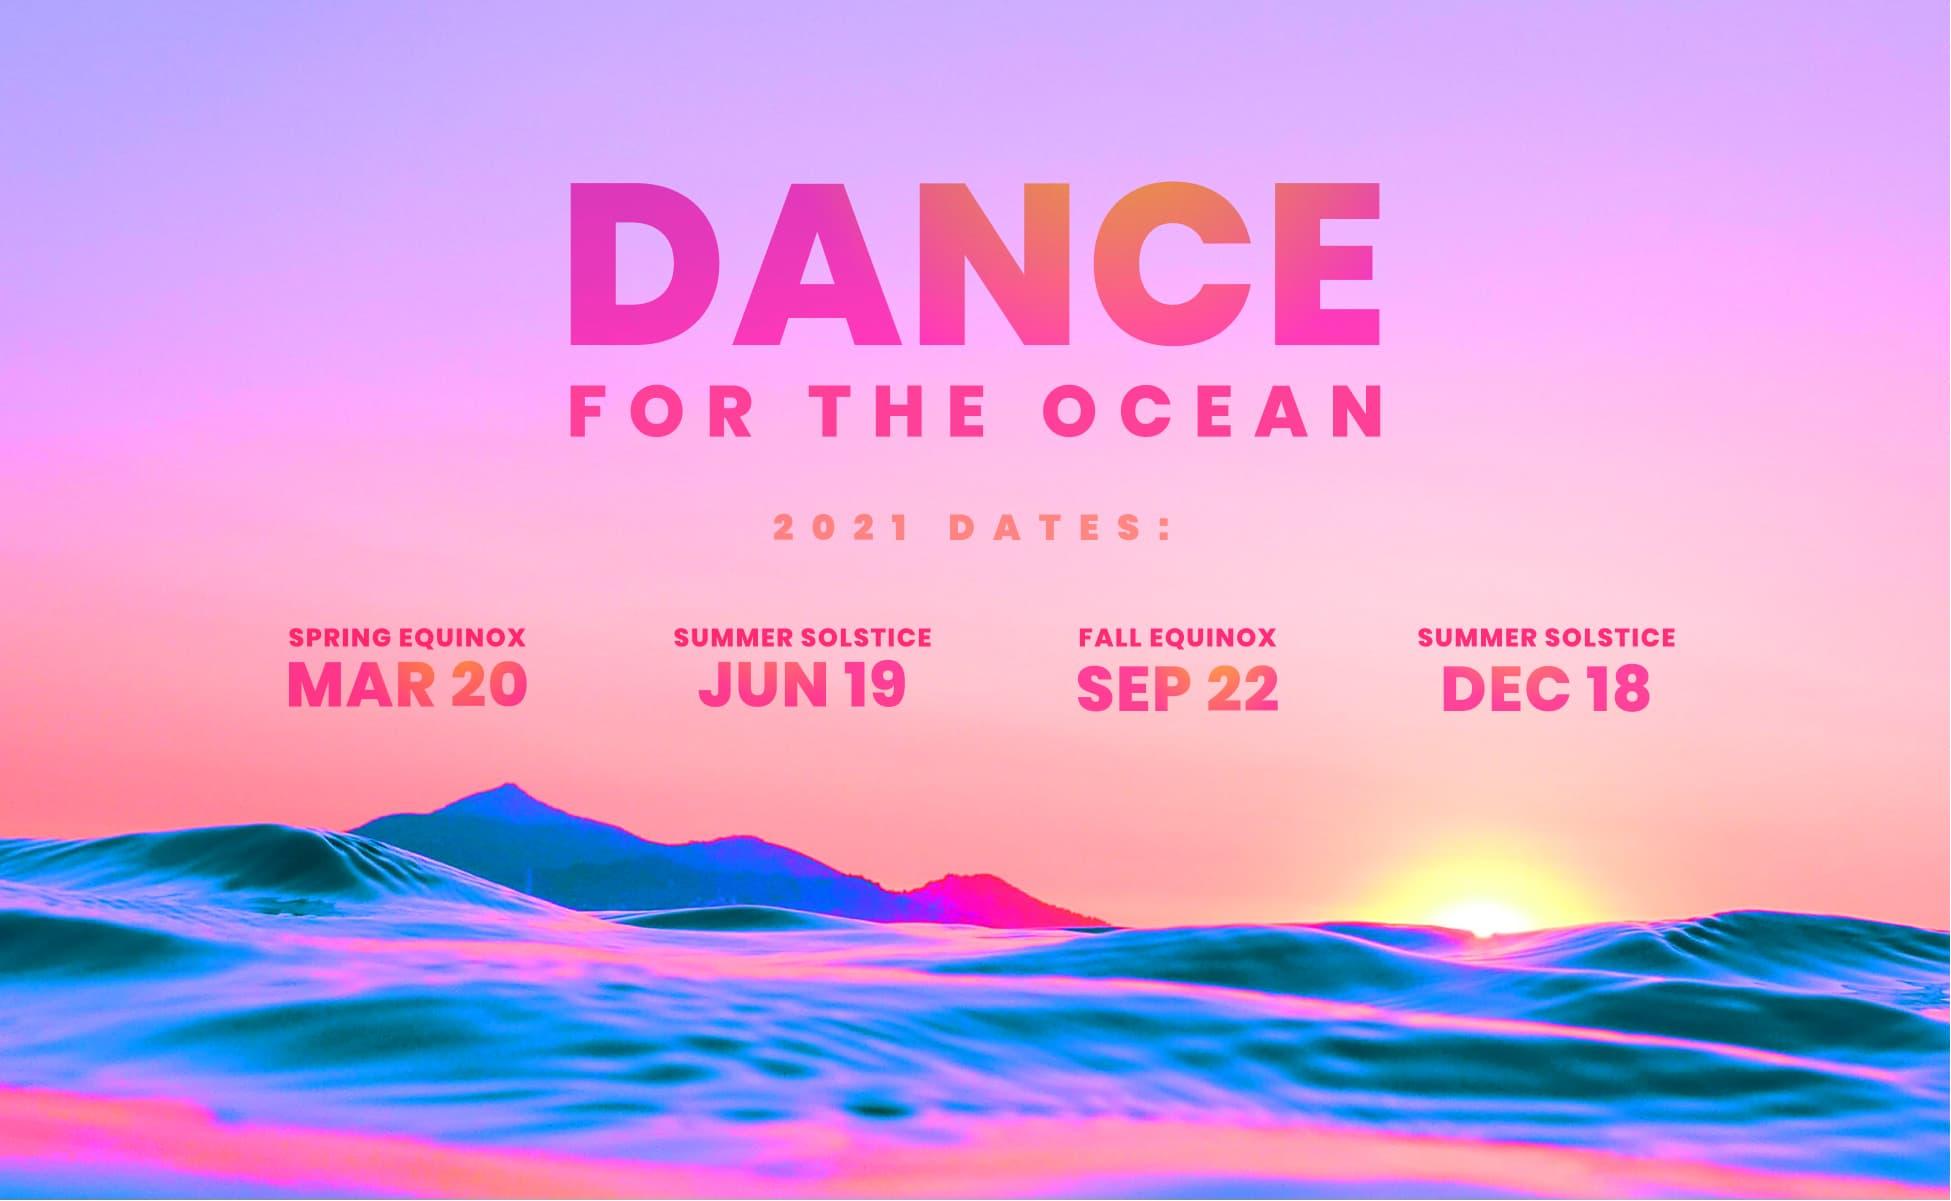 Fance for the Ocean